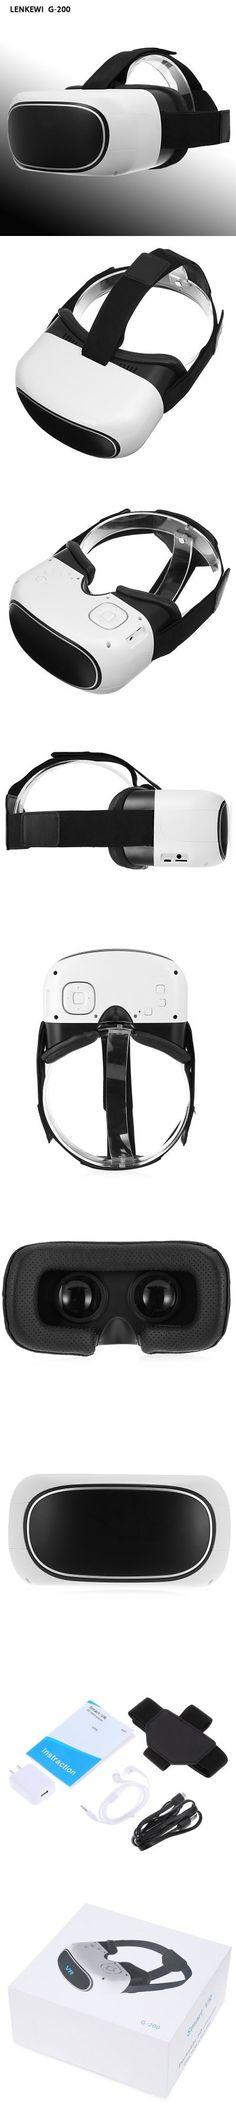 LENKEWI G - 200 All-in-one WiFi 3D VR Headset